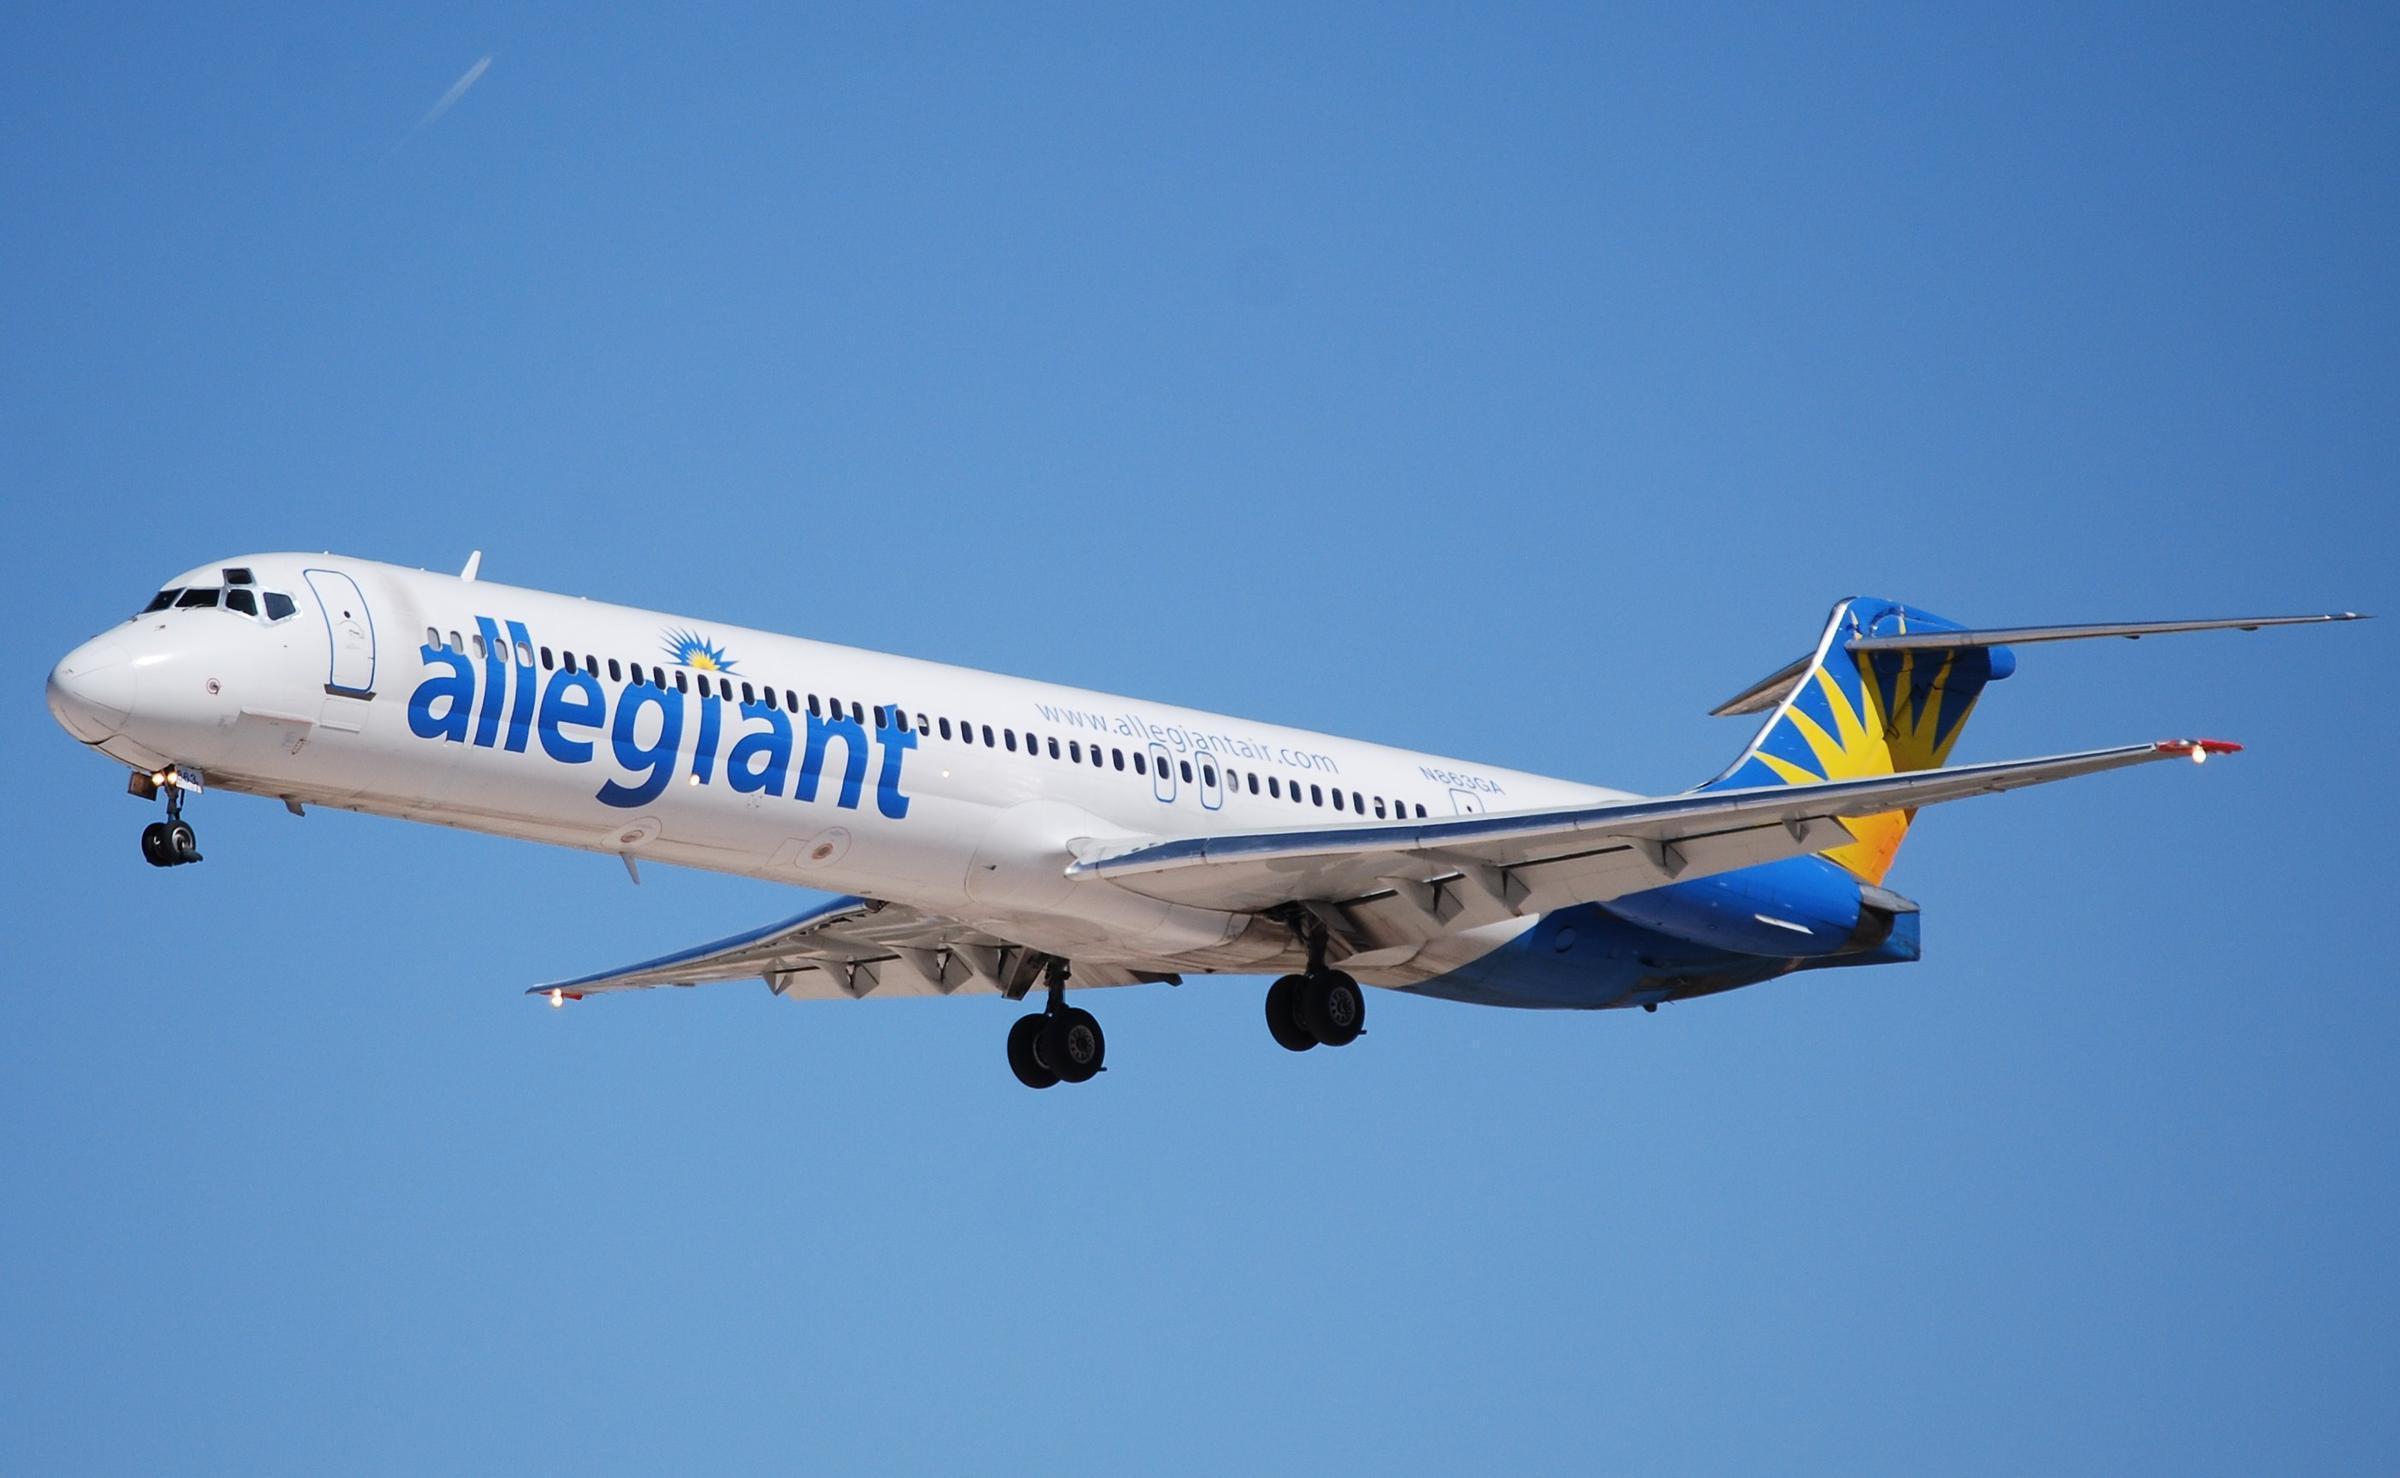 Allegiant Air Pulls Out Of Casper Ending Vegas Service